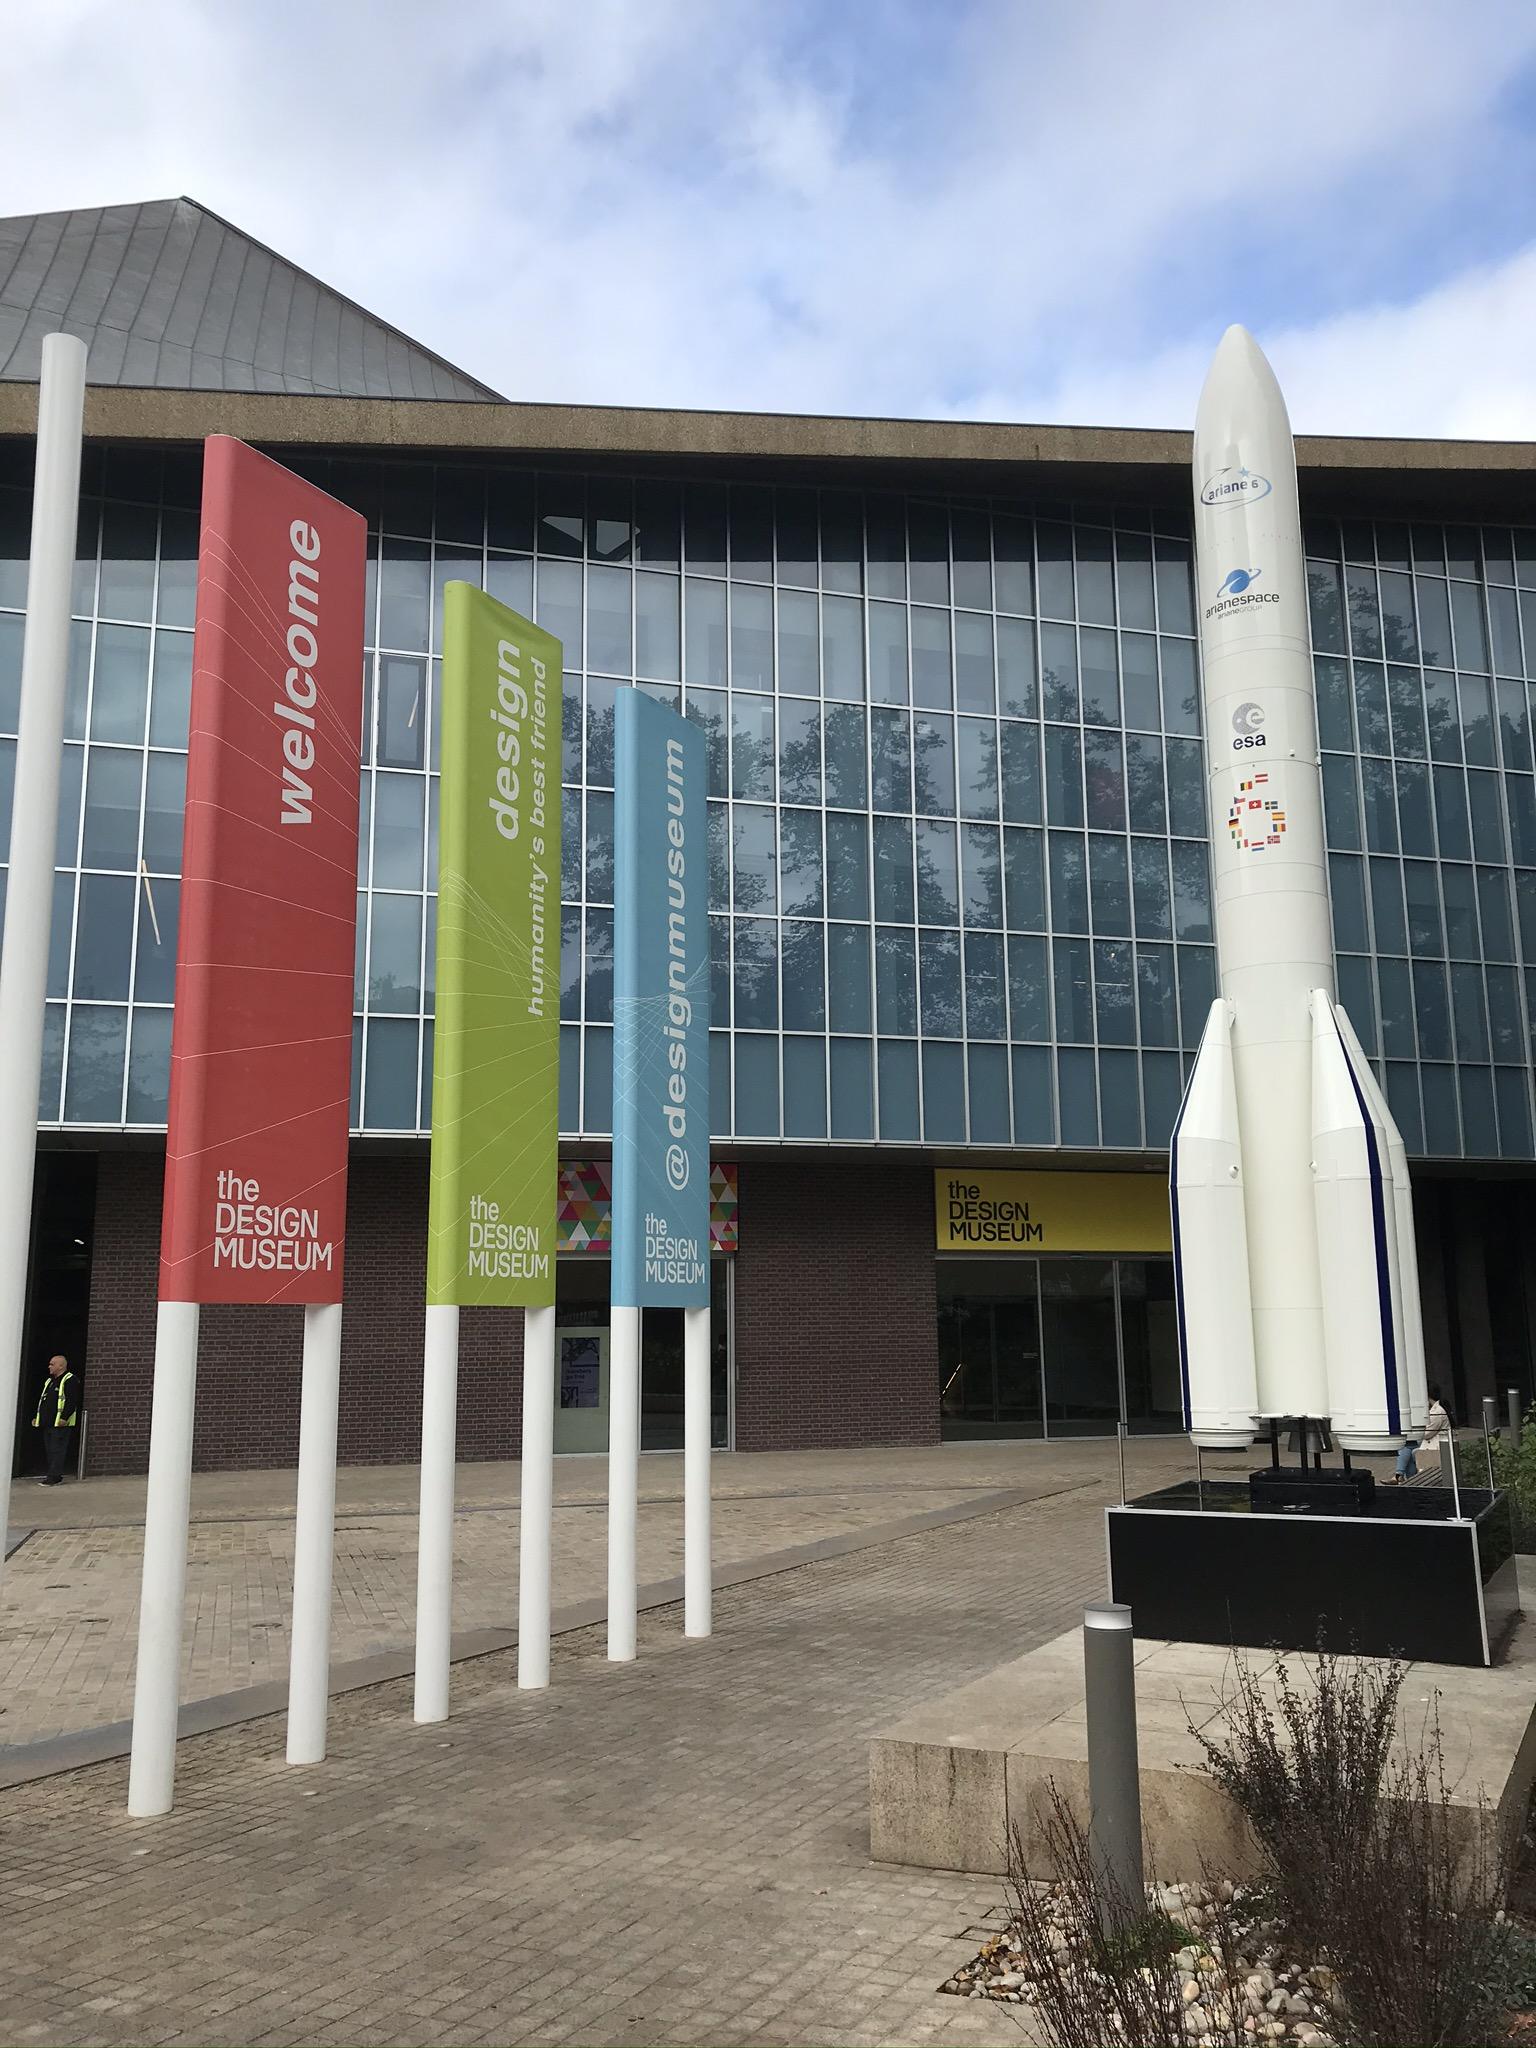 Ariane-6 1:10 space rocket model